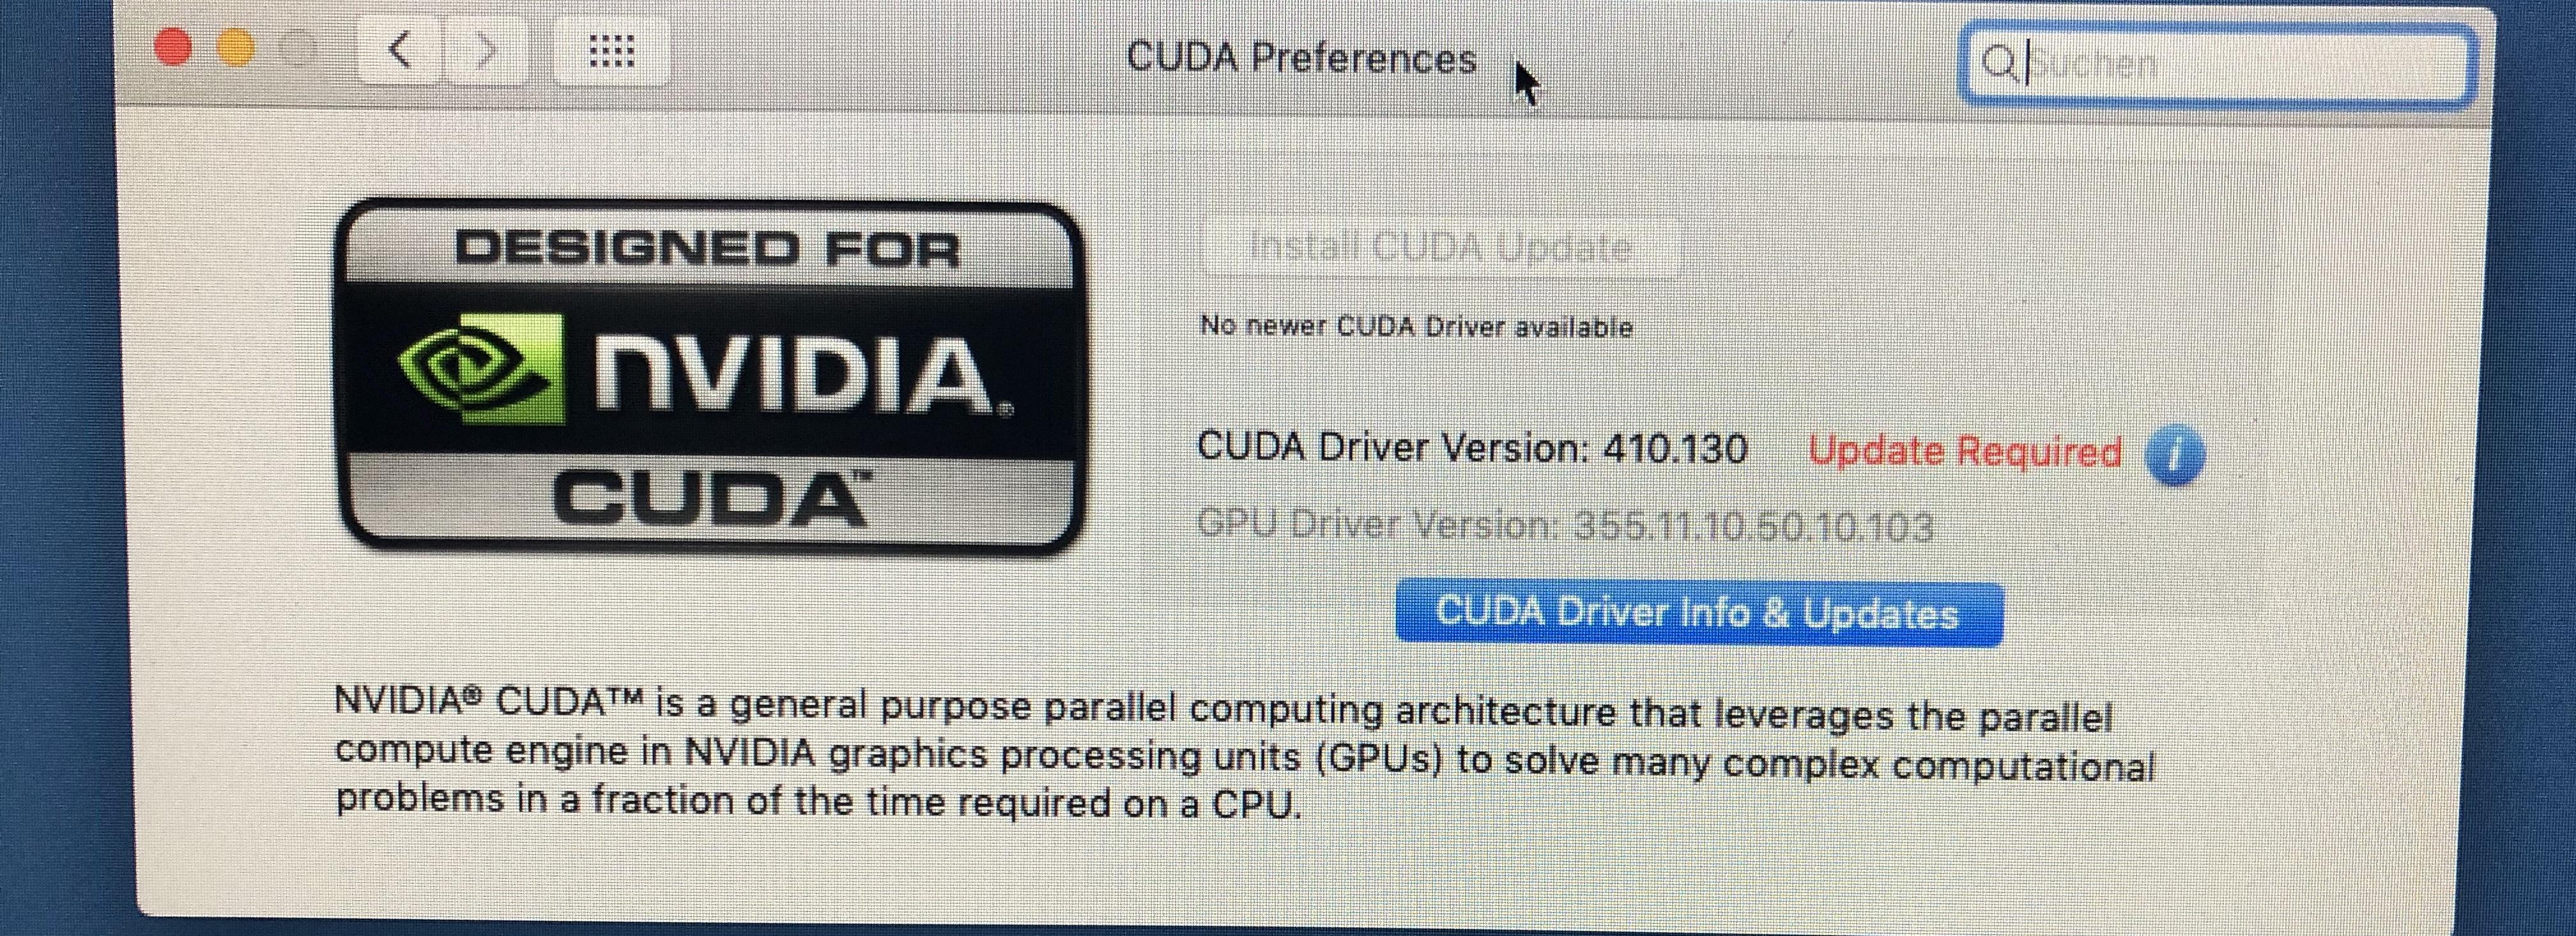 NVIDIA GeForce GTX 775M 2gb VRAM not work… - Apple Community